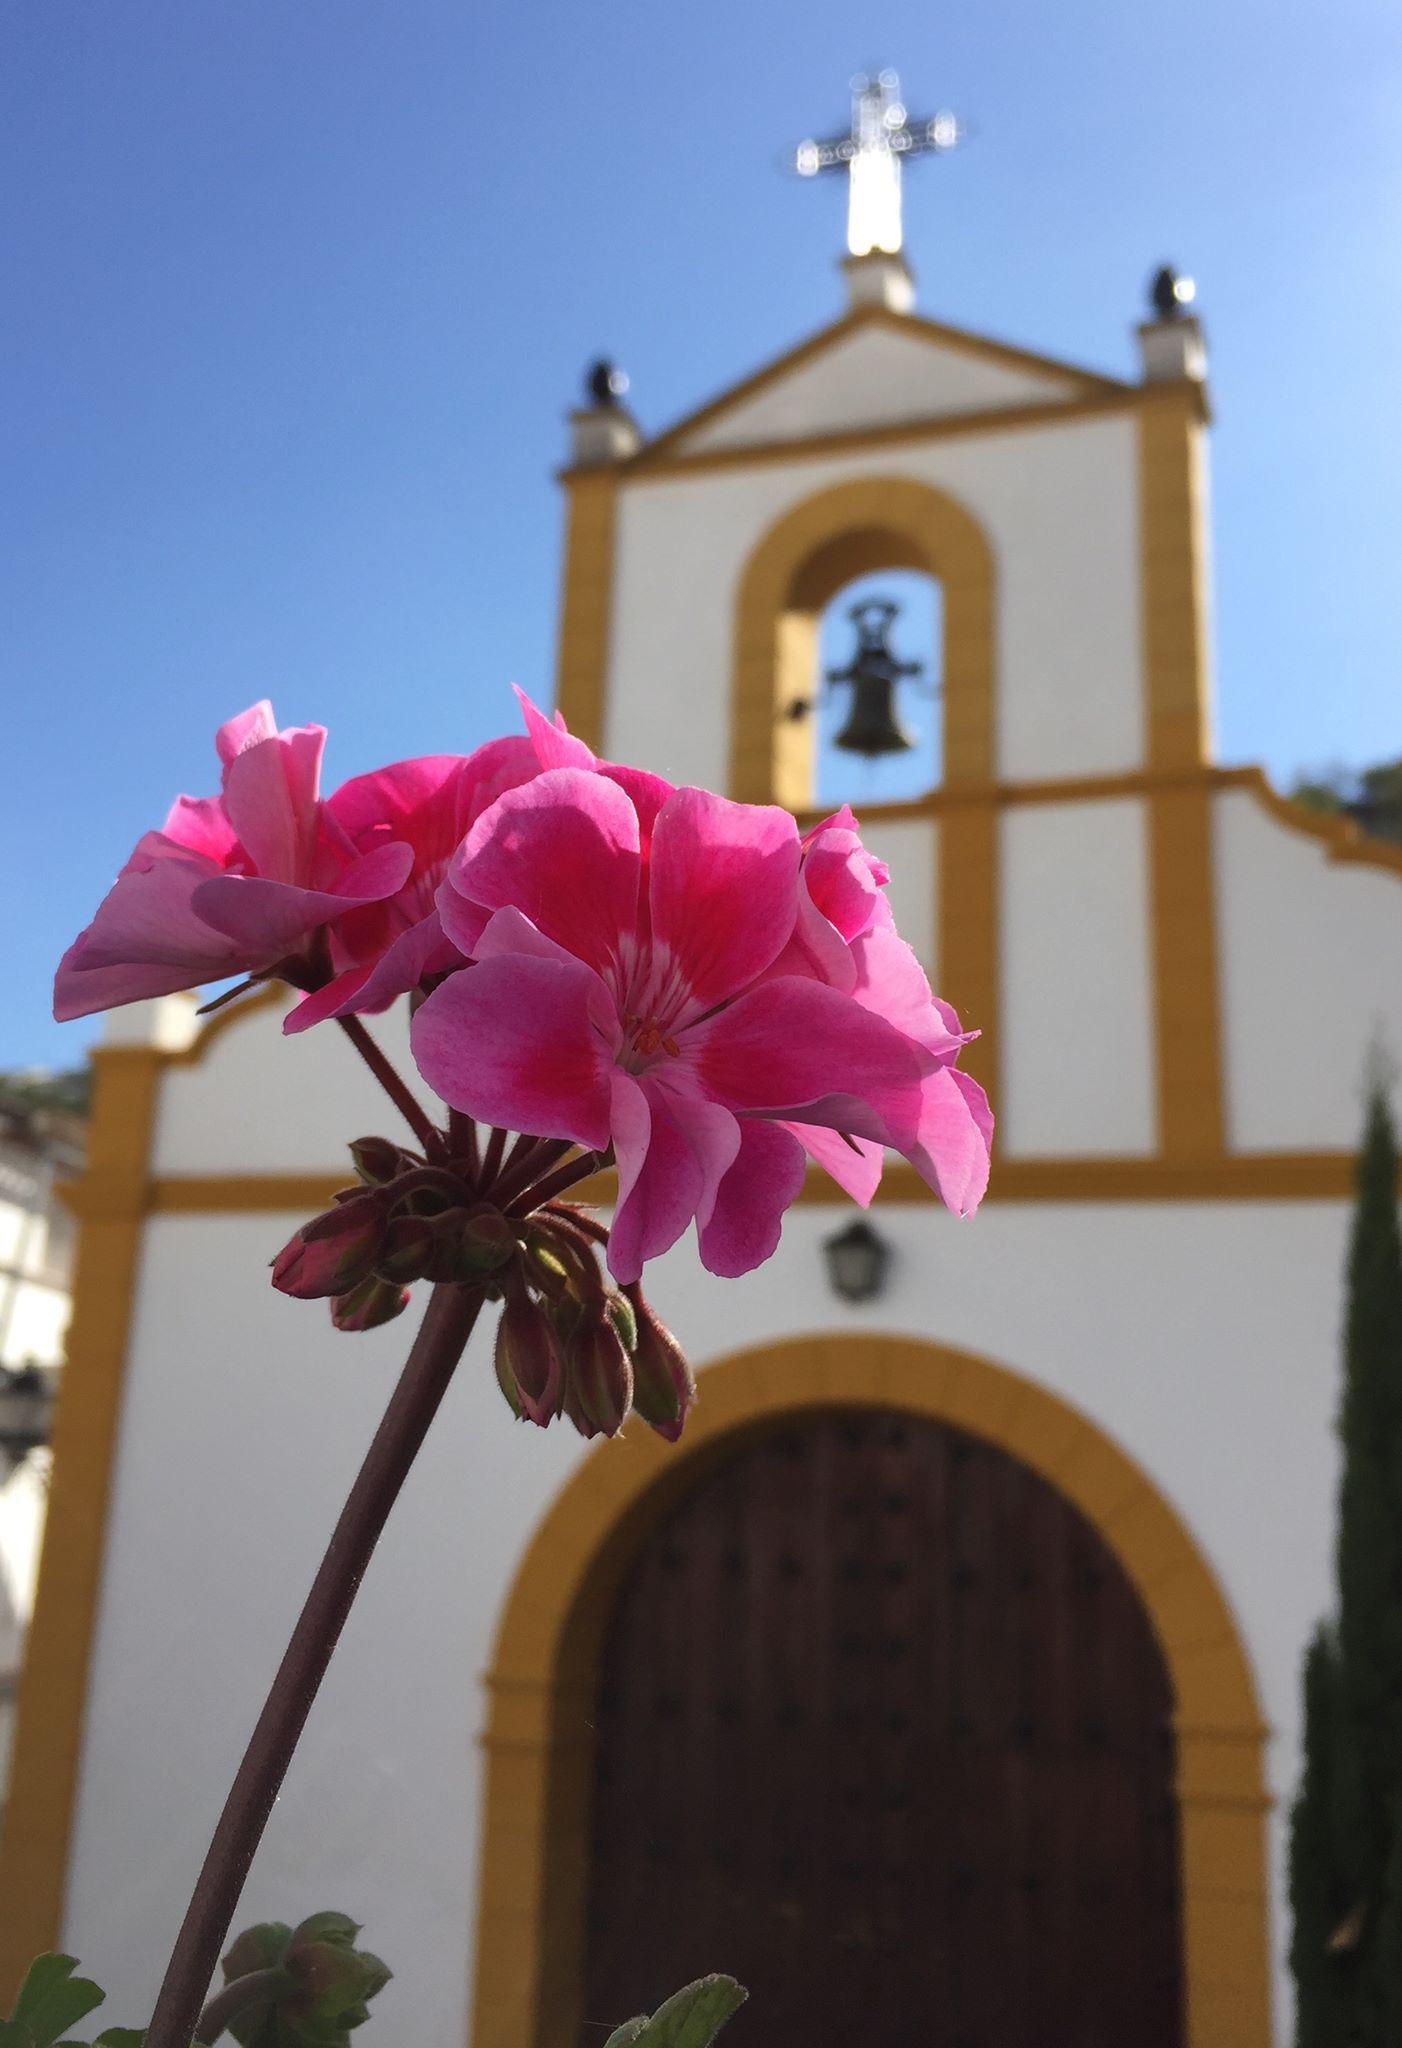 Village andalousie